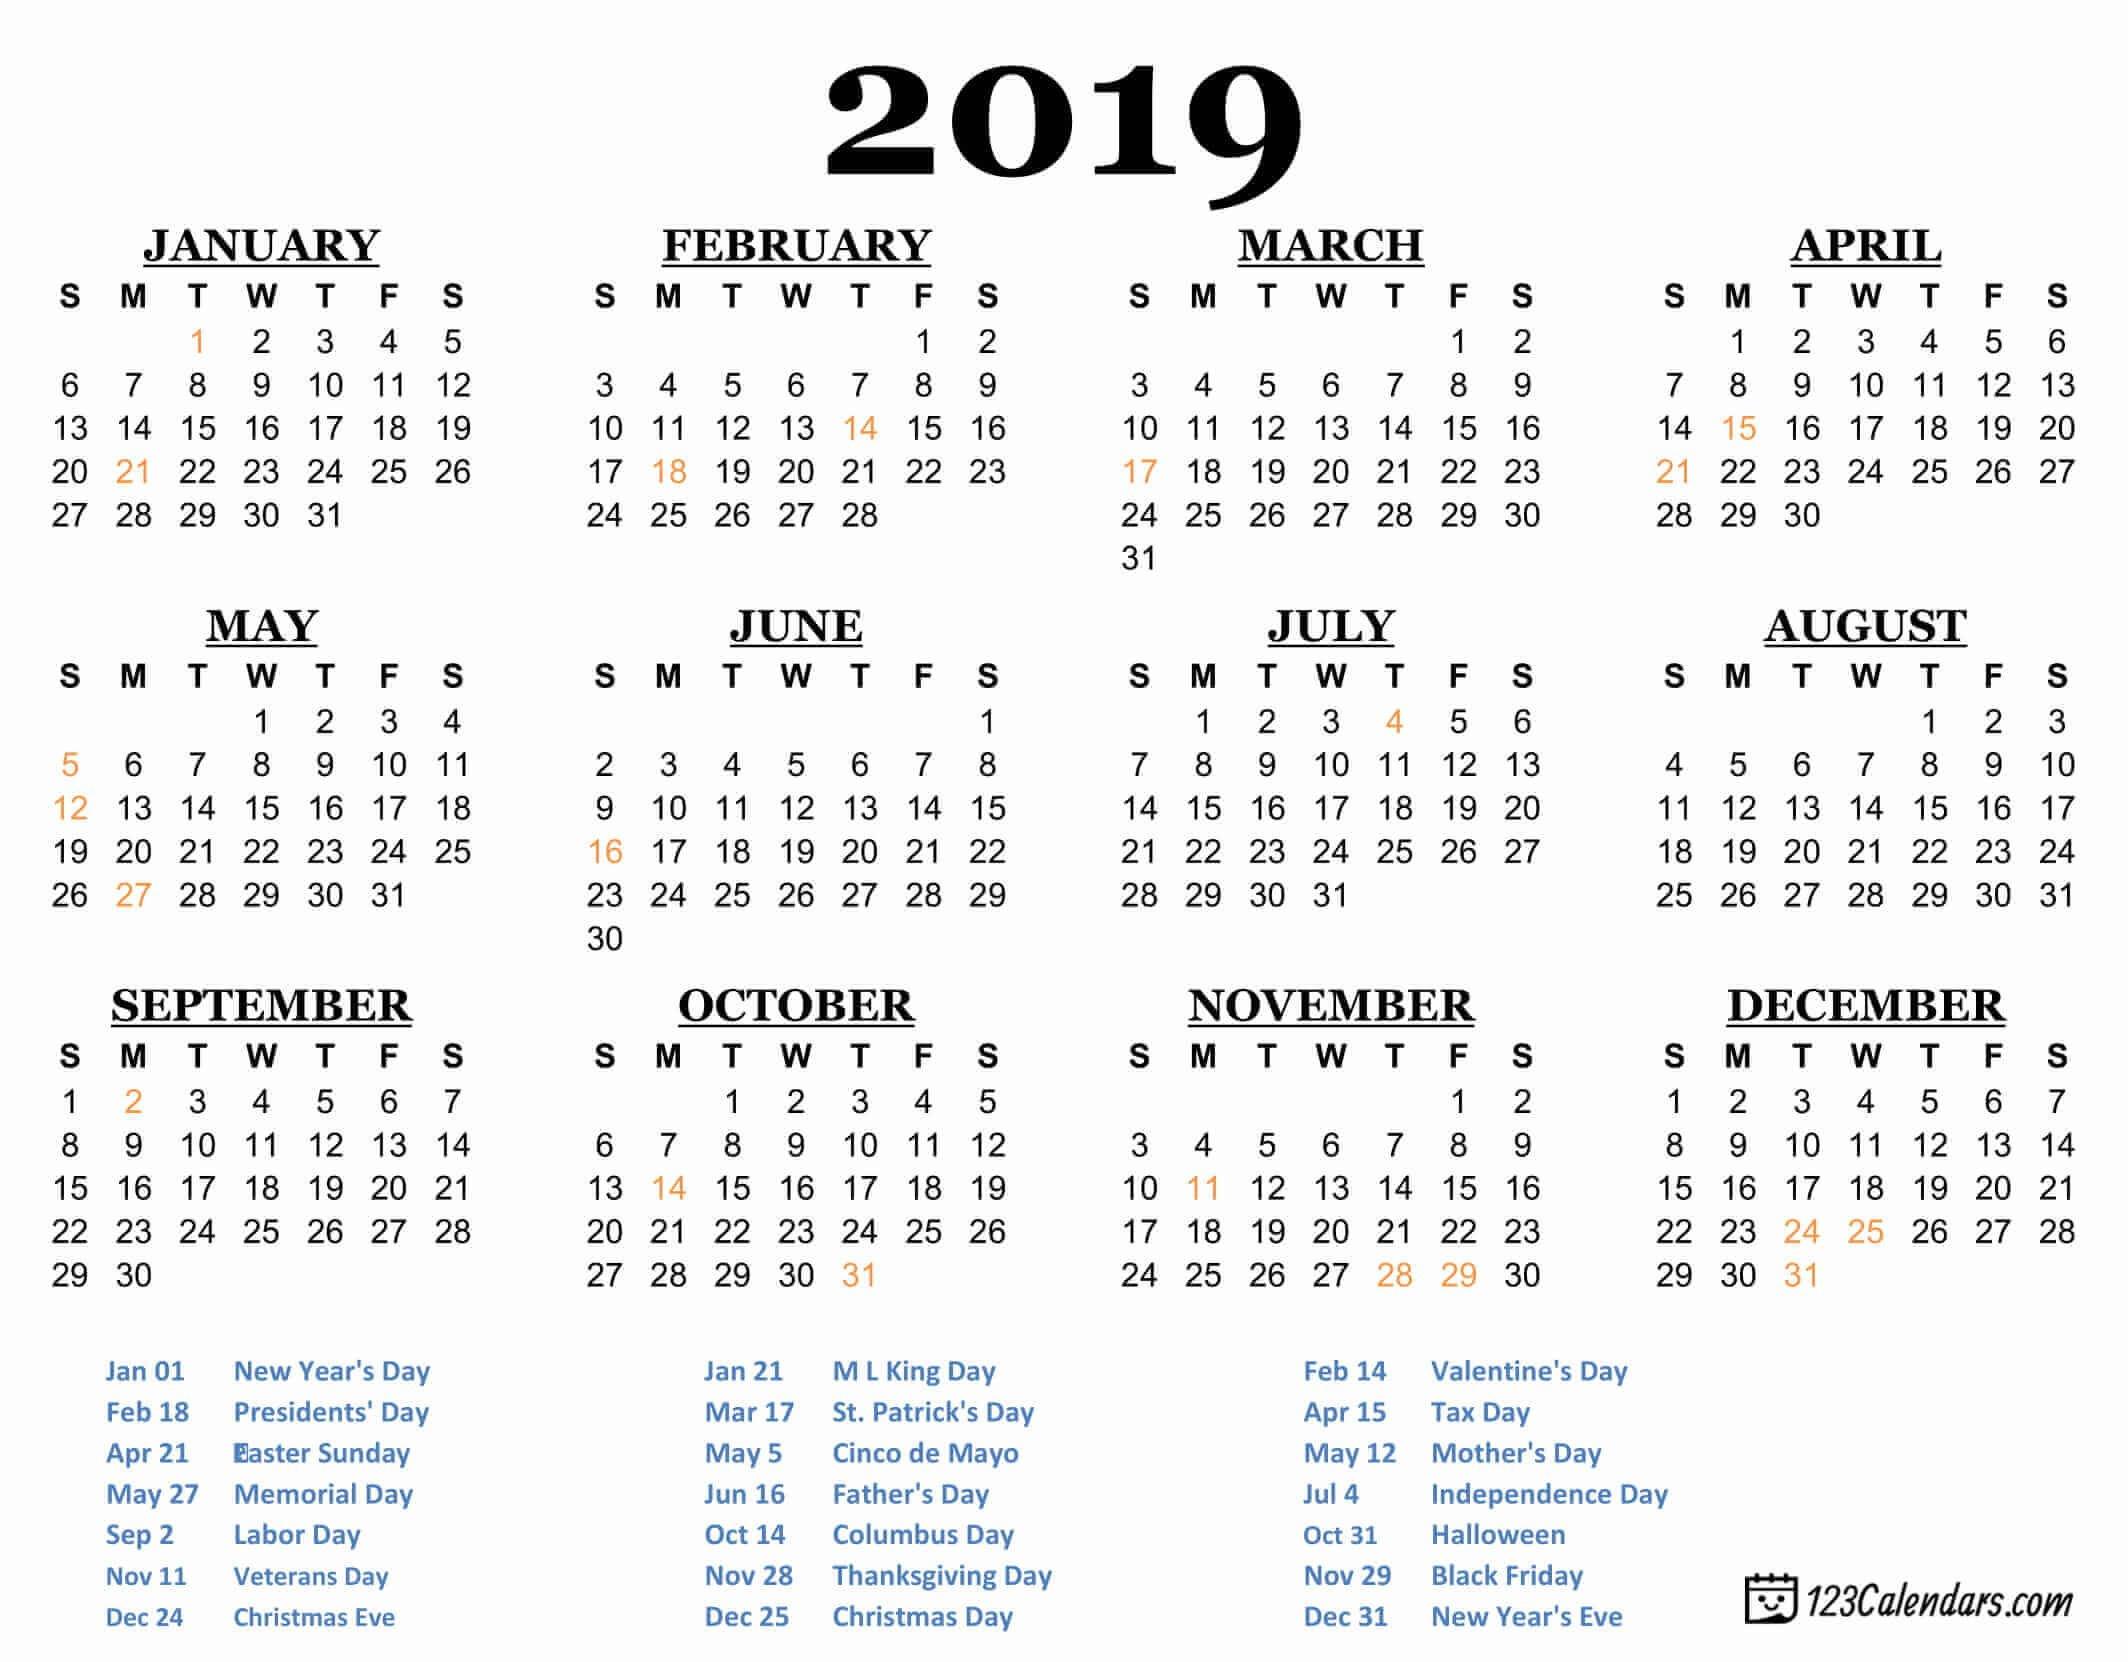 Free Printable 2019 Calendar | 123Calendars Calendar 2019 Printable